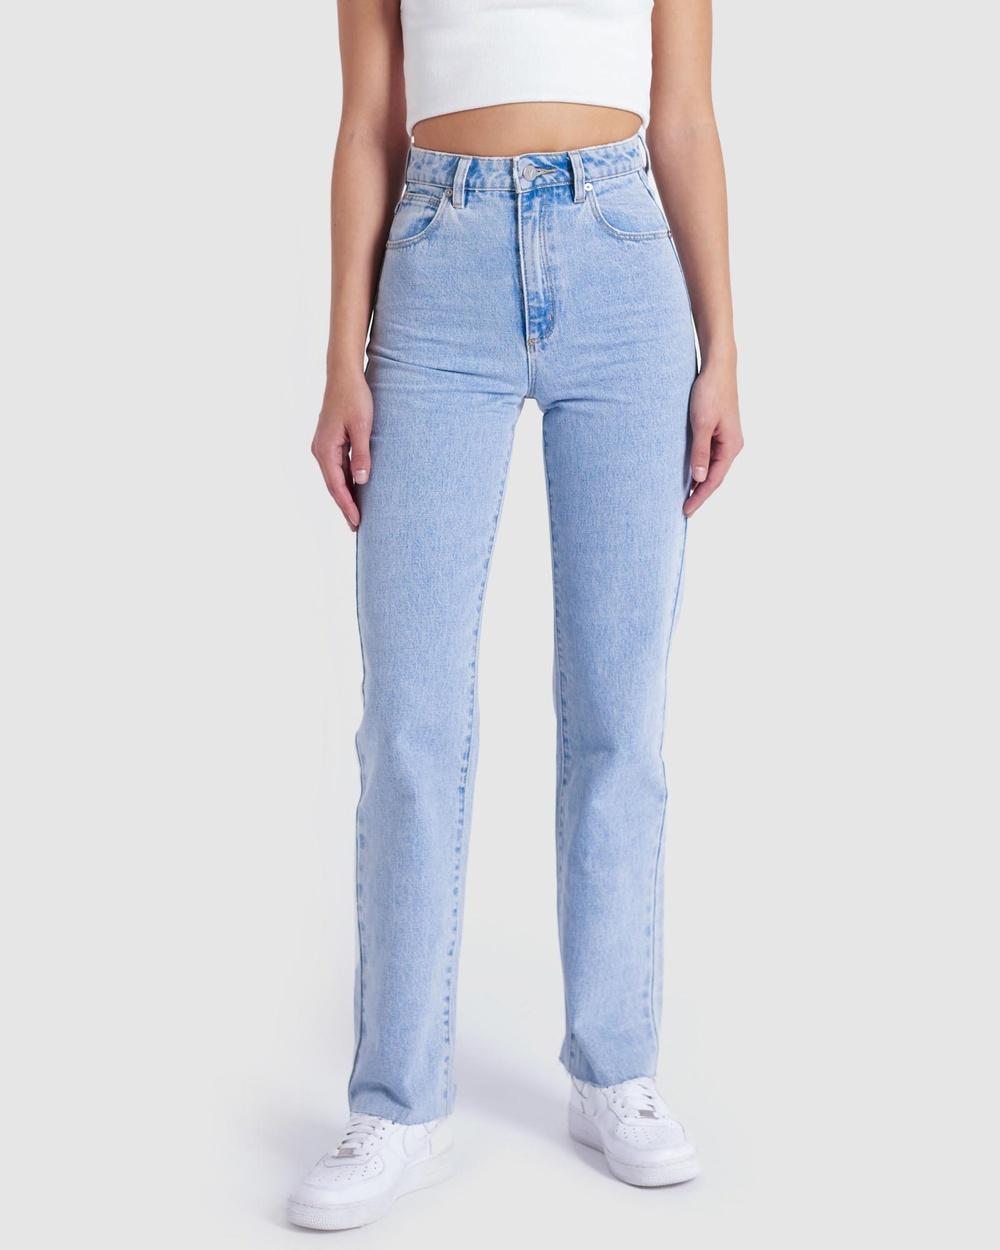 Abrand A '94 High Straight Jeans High-Waisted Walkaway